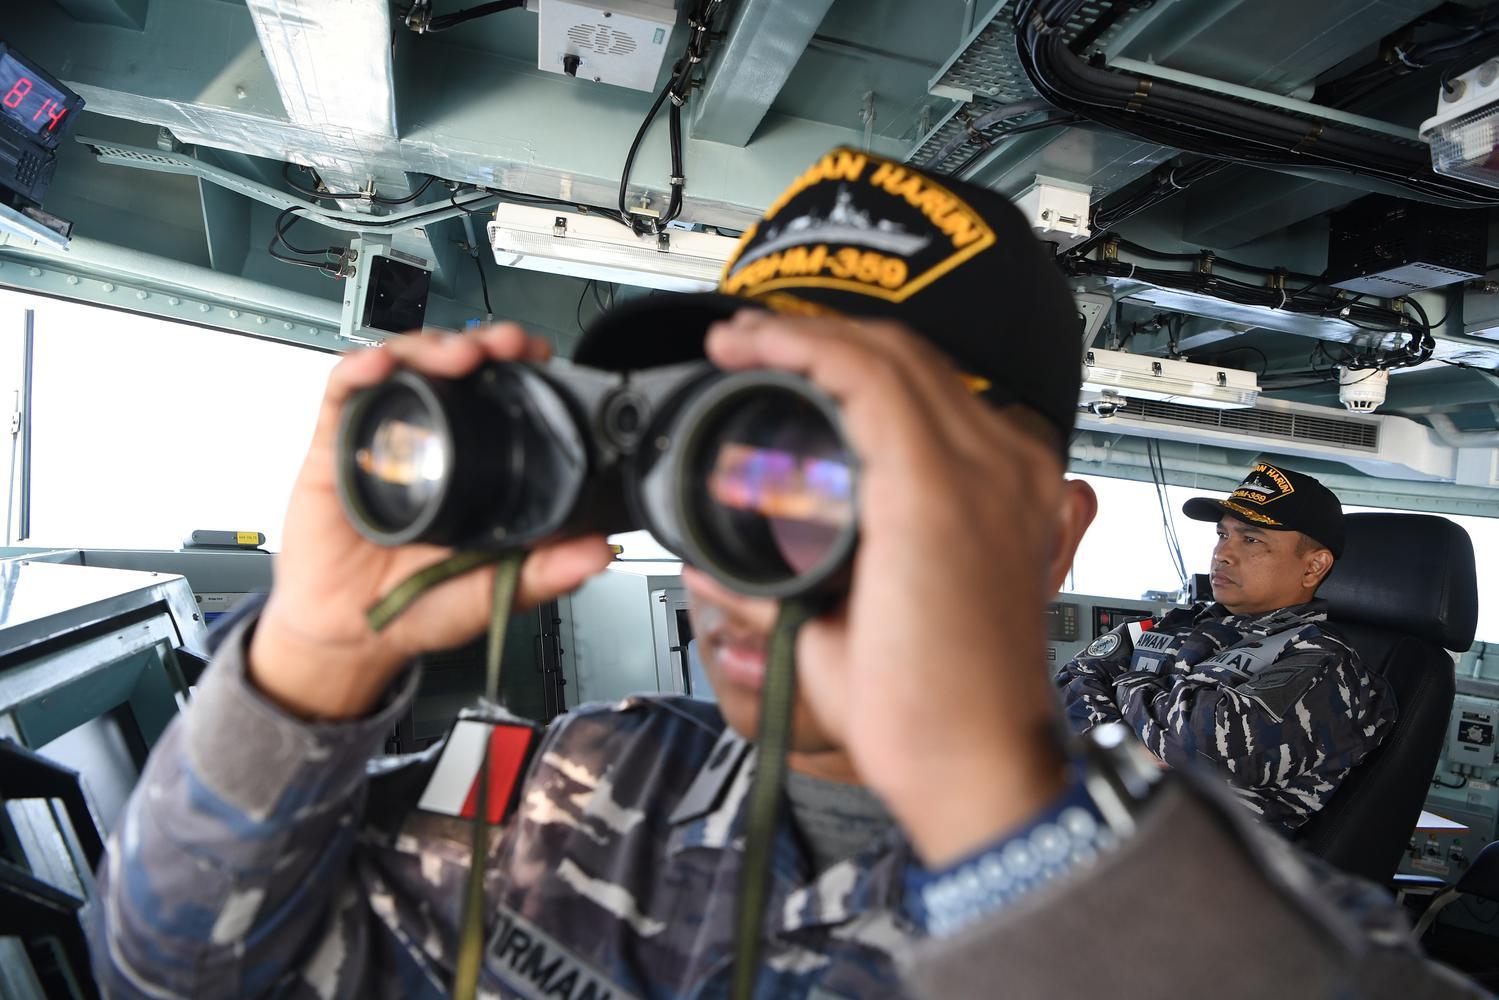 Komadan KRI Usman Harun Kolonel Laut (P) Himawan (kanan) mengamati monitor di anjungan KRI Usman Harun-359 ketika memasuki perairan Timor Leste di Dili, Timor Leste, Rabu (11/12/2019).